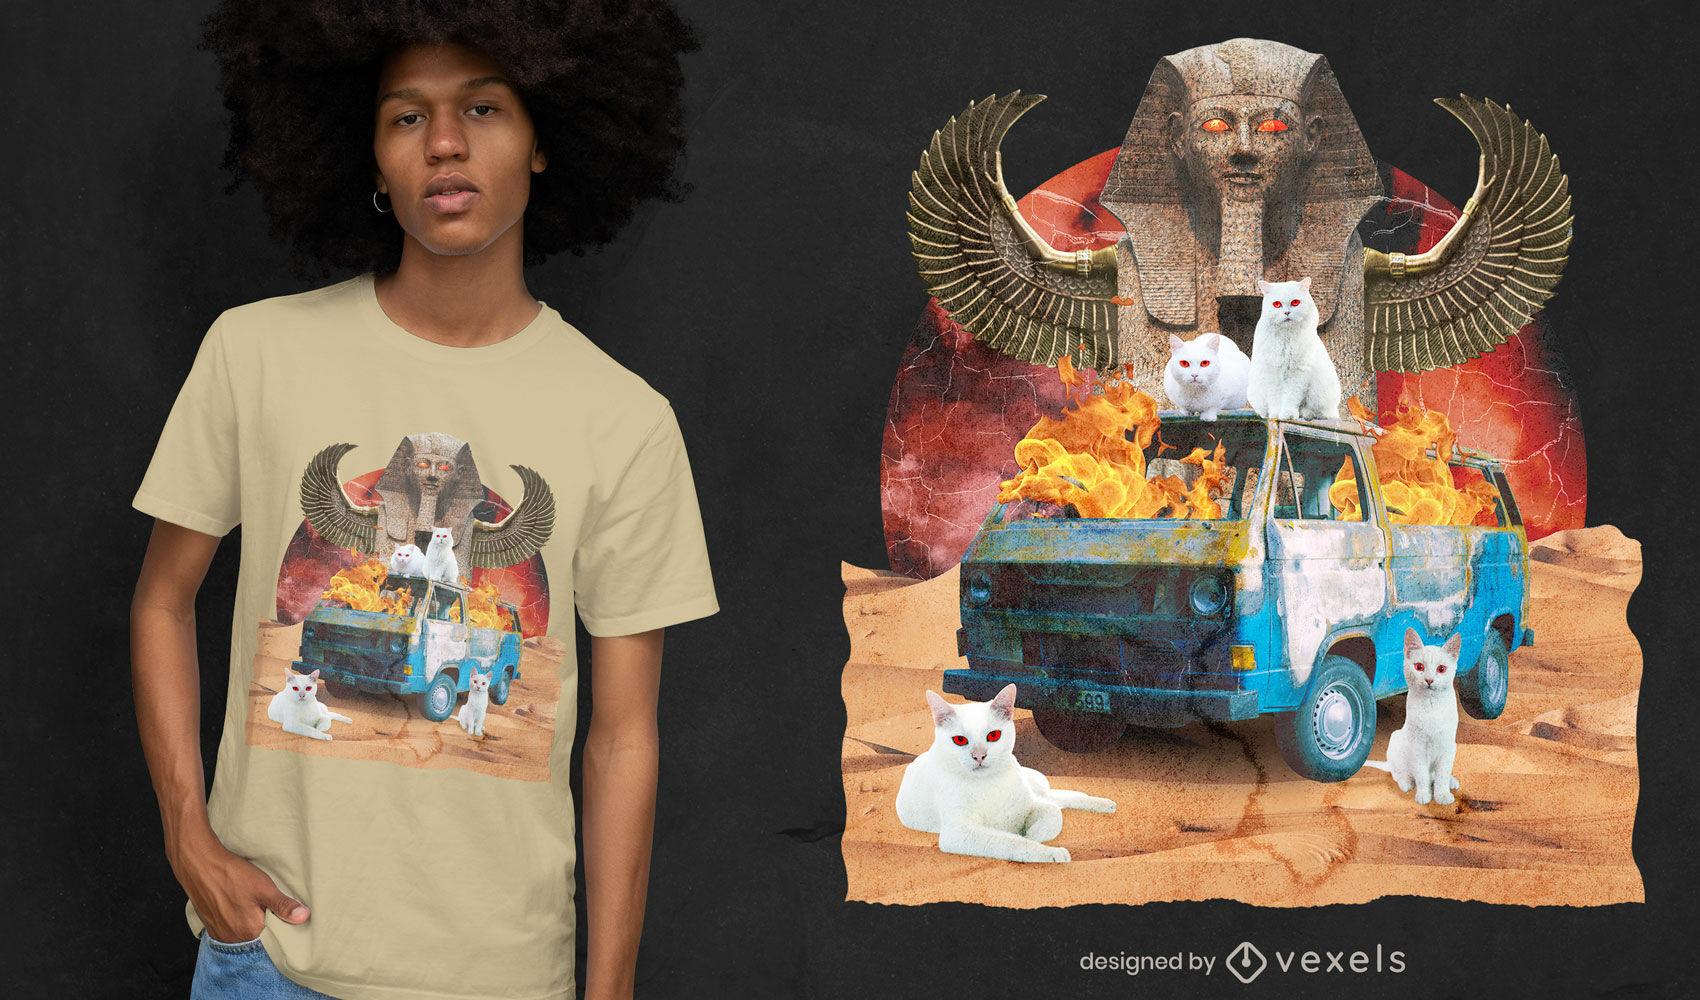 Camiseta del monumento de egipto del collage del caos del gato psd